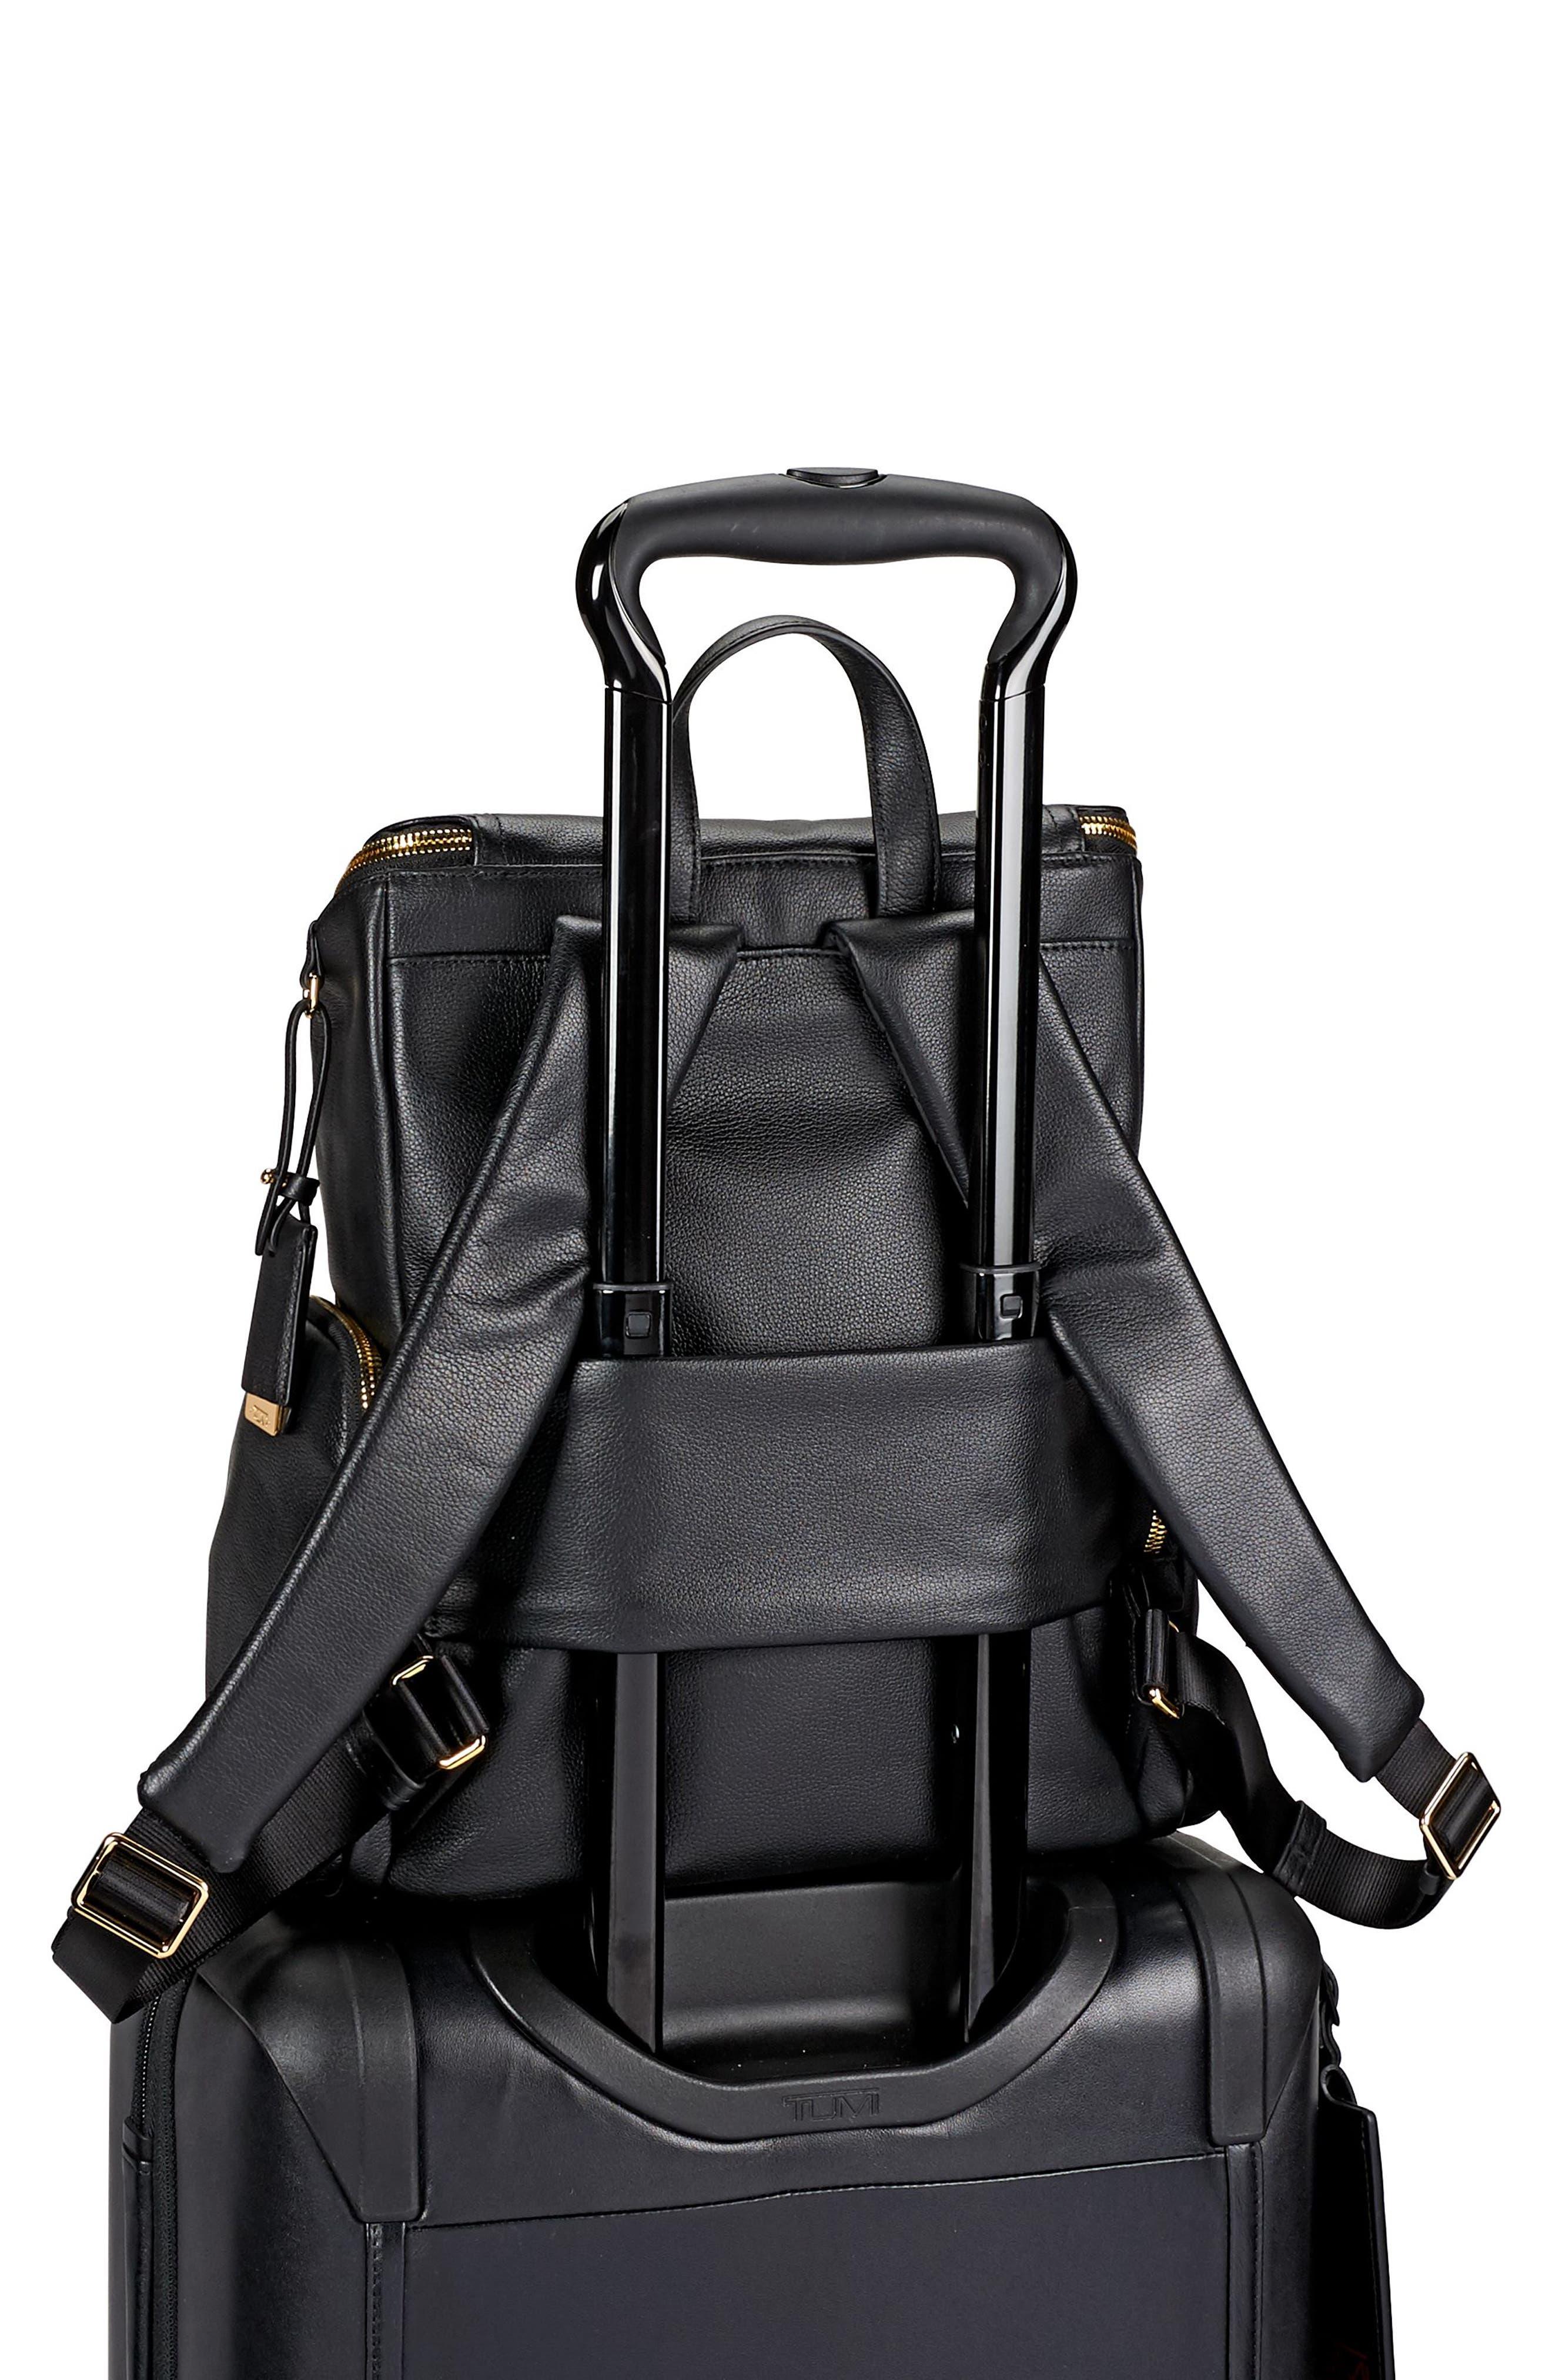 Voyageur Lexa Leather Backpack,                             Alternate thumbnail 6, color,                             001